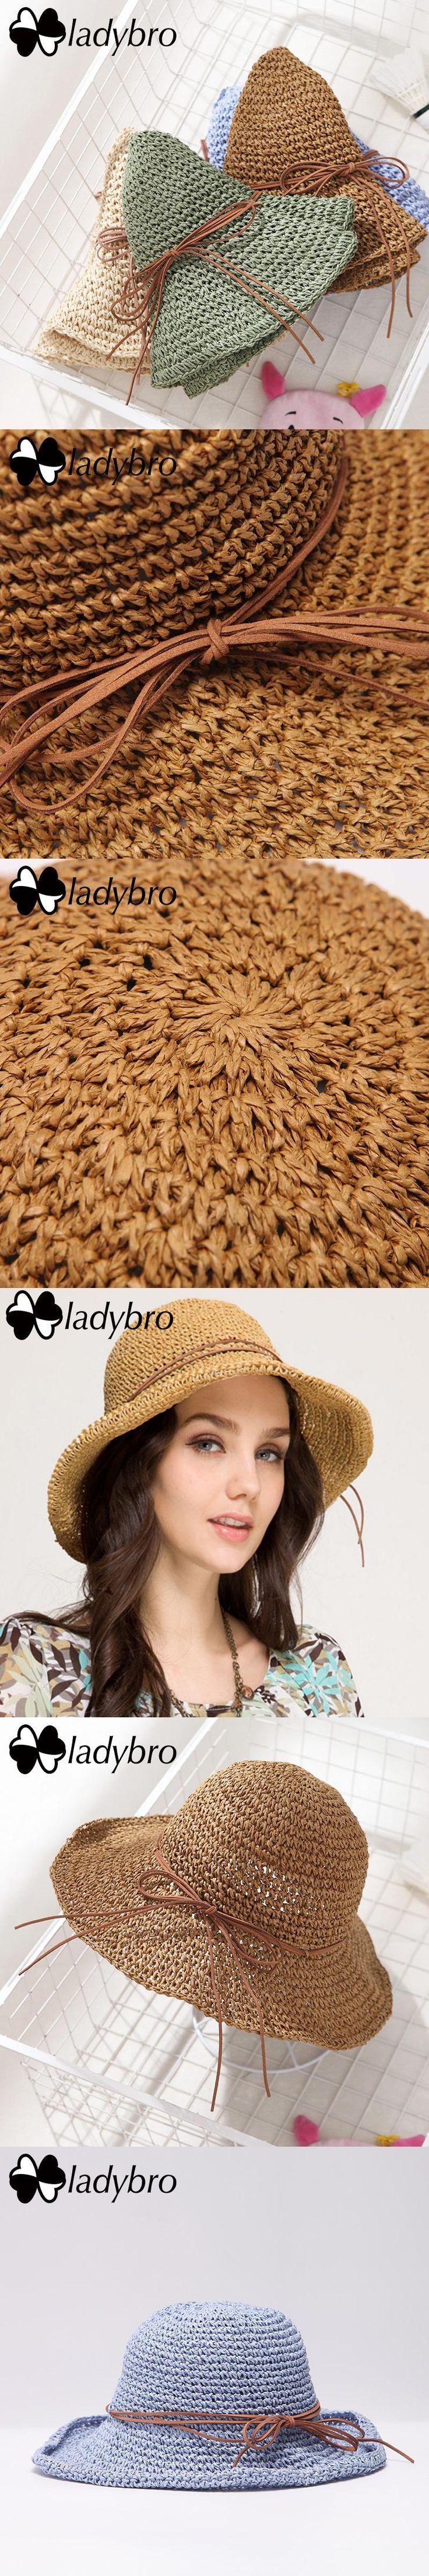 Ladybro Brand Ladies Sun Hat For Women Bowknot Raffia Straw Hat Foldable Summer Hat Wide Brim Beach Hat Female Chapeau Femme